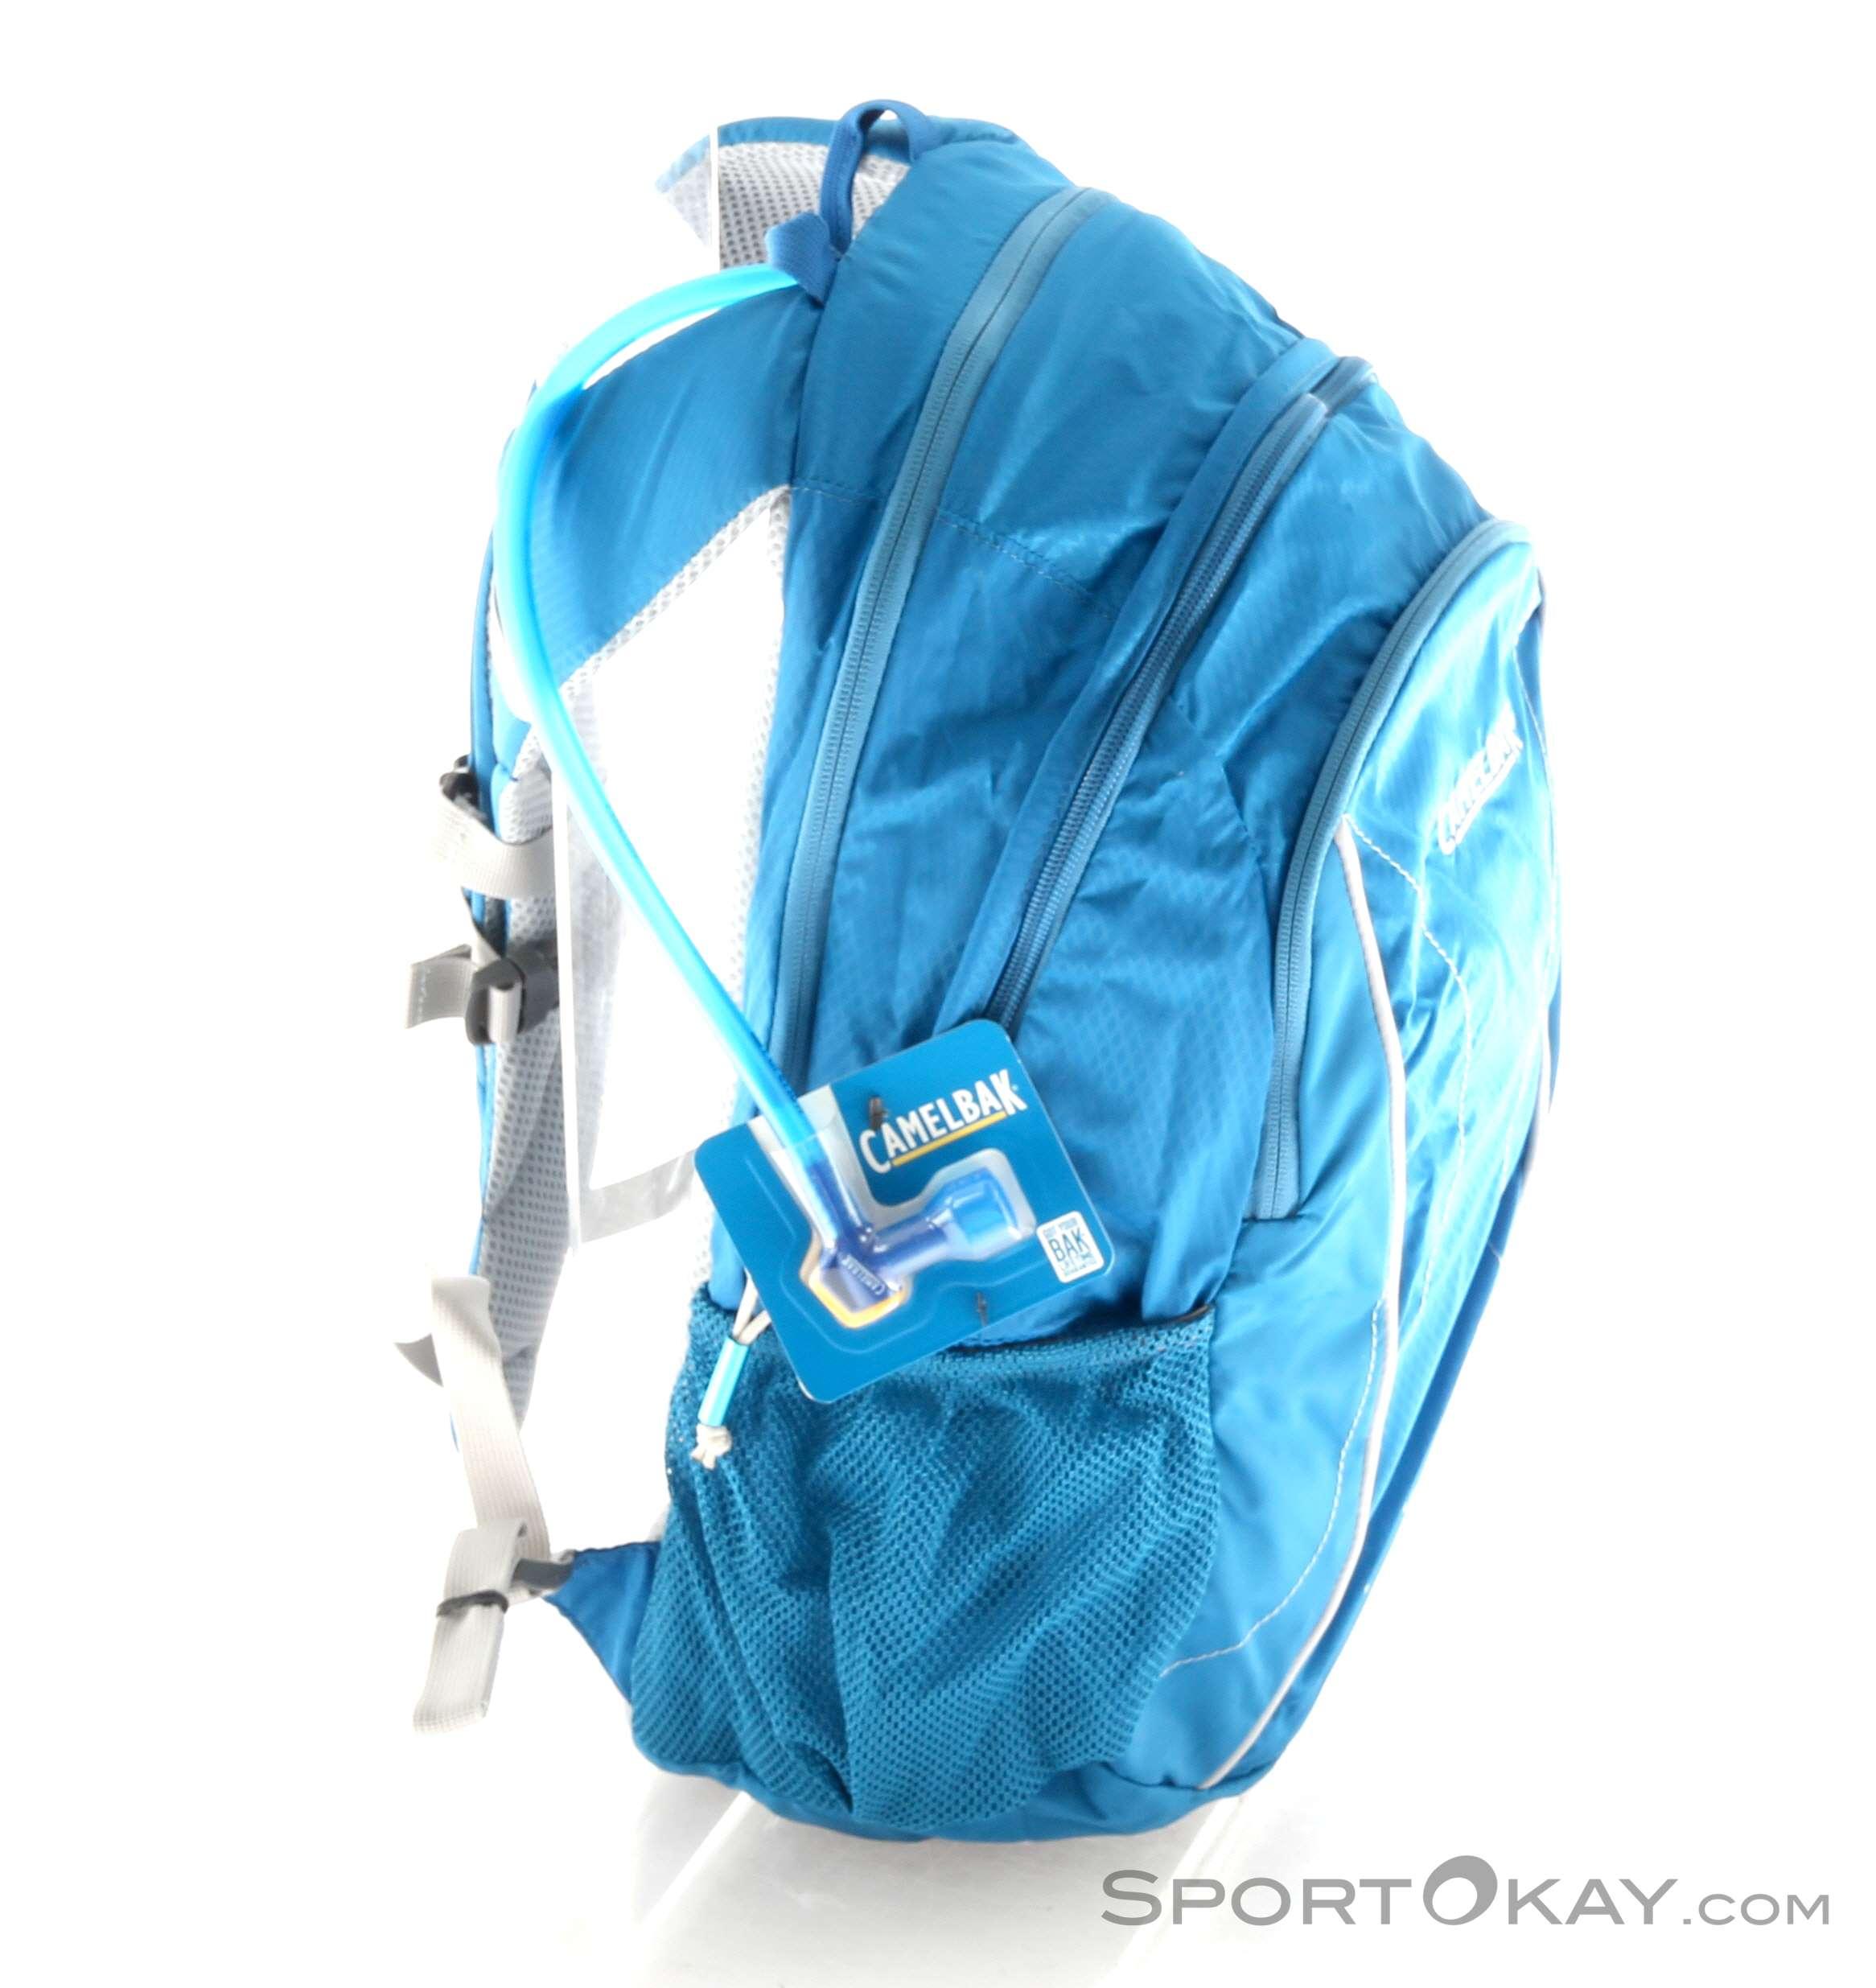 camelbak day star 18 damen rucksack mit trinksystem. Black Bedroom Furniture Sets. Home Design Ideas